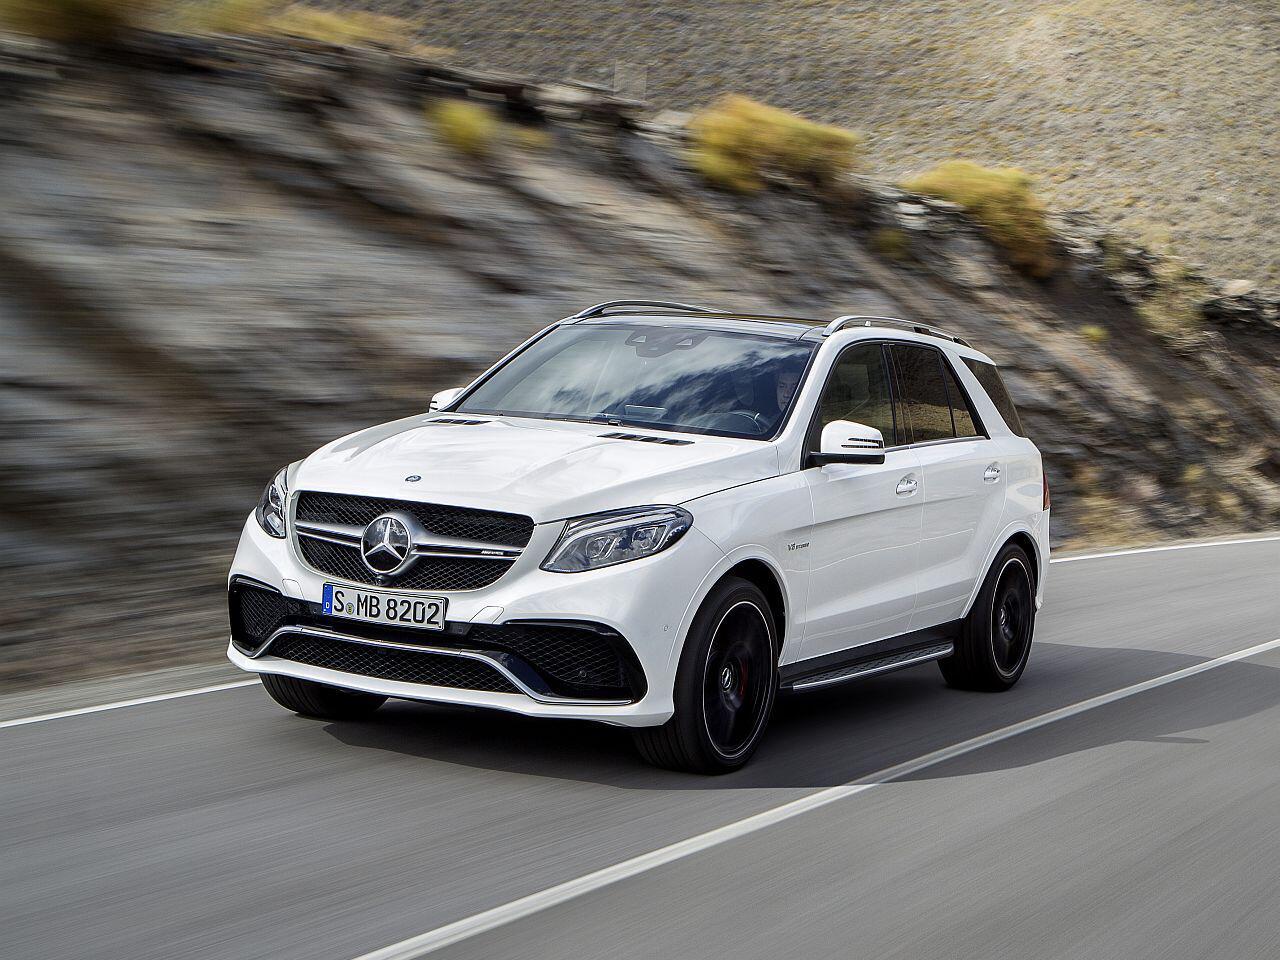 Bild zu Mercedes AMG GLE 63 S